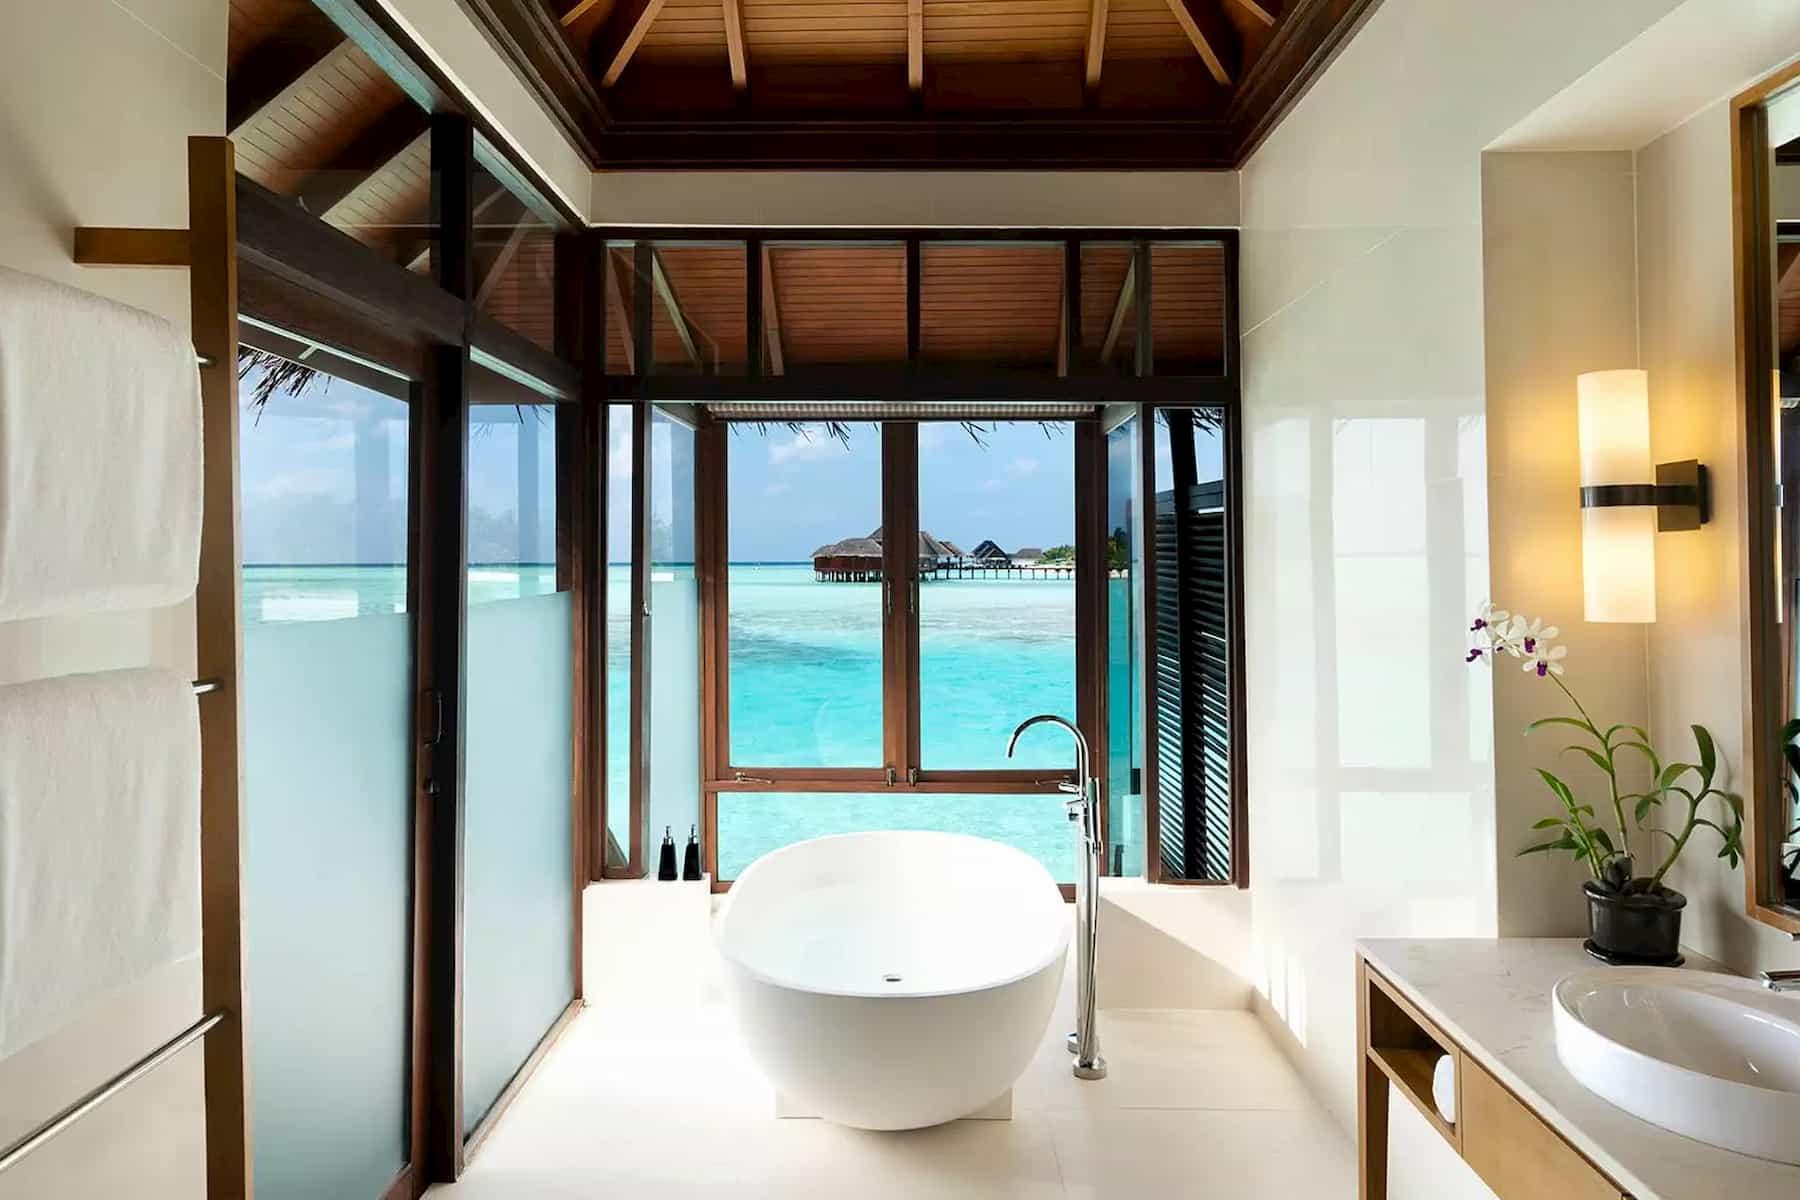 Anantara Veli Resort Maldive deluxe overwater bungalow